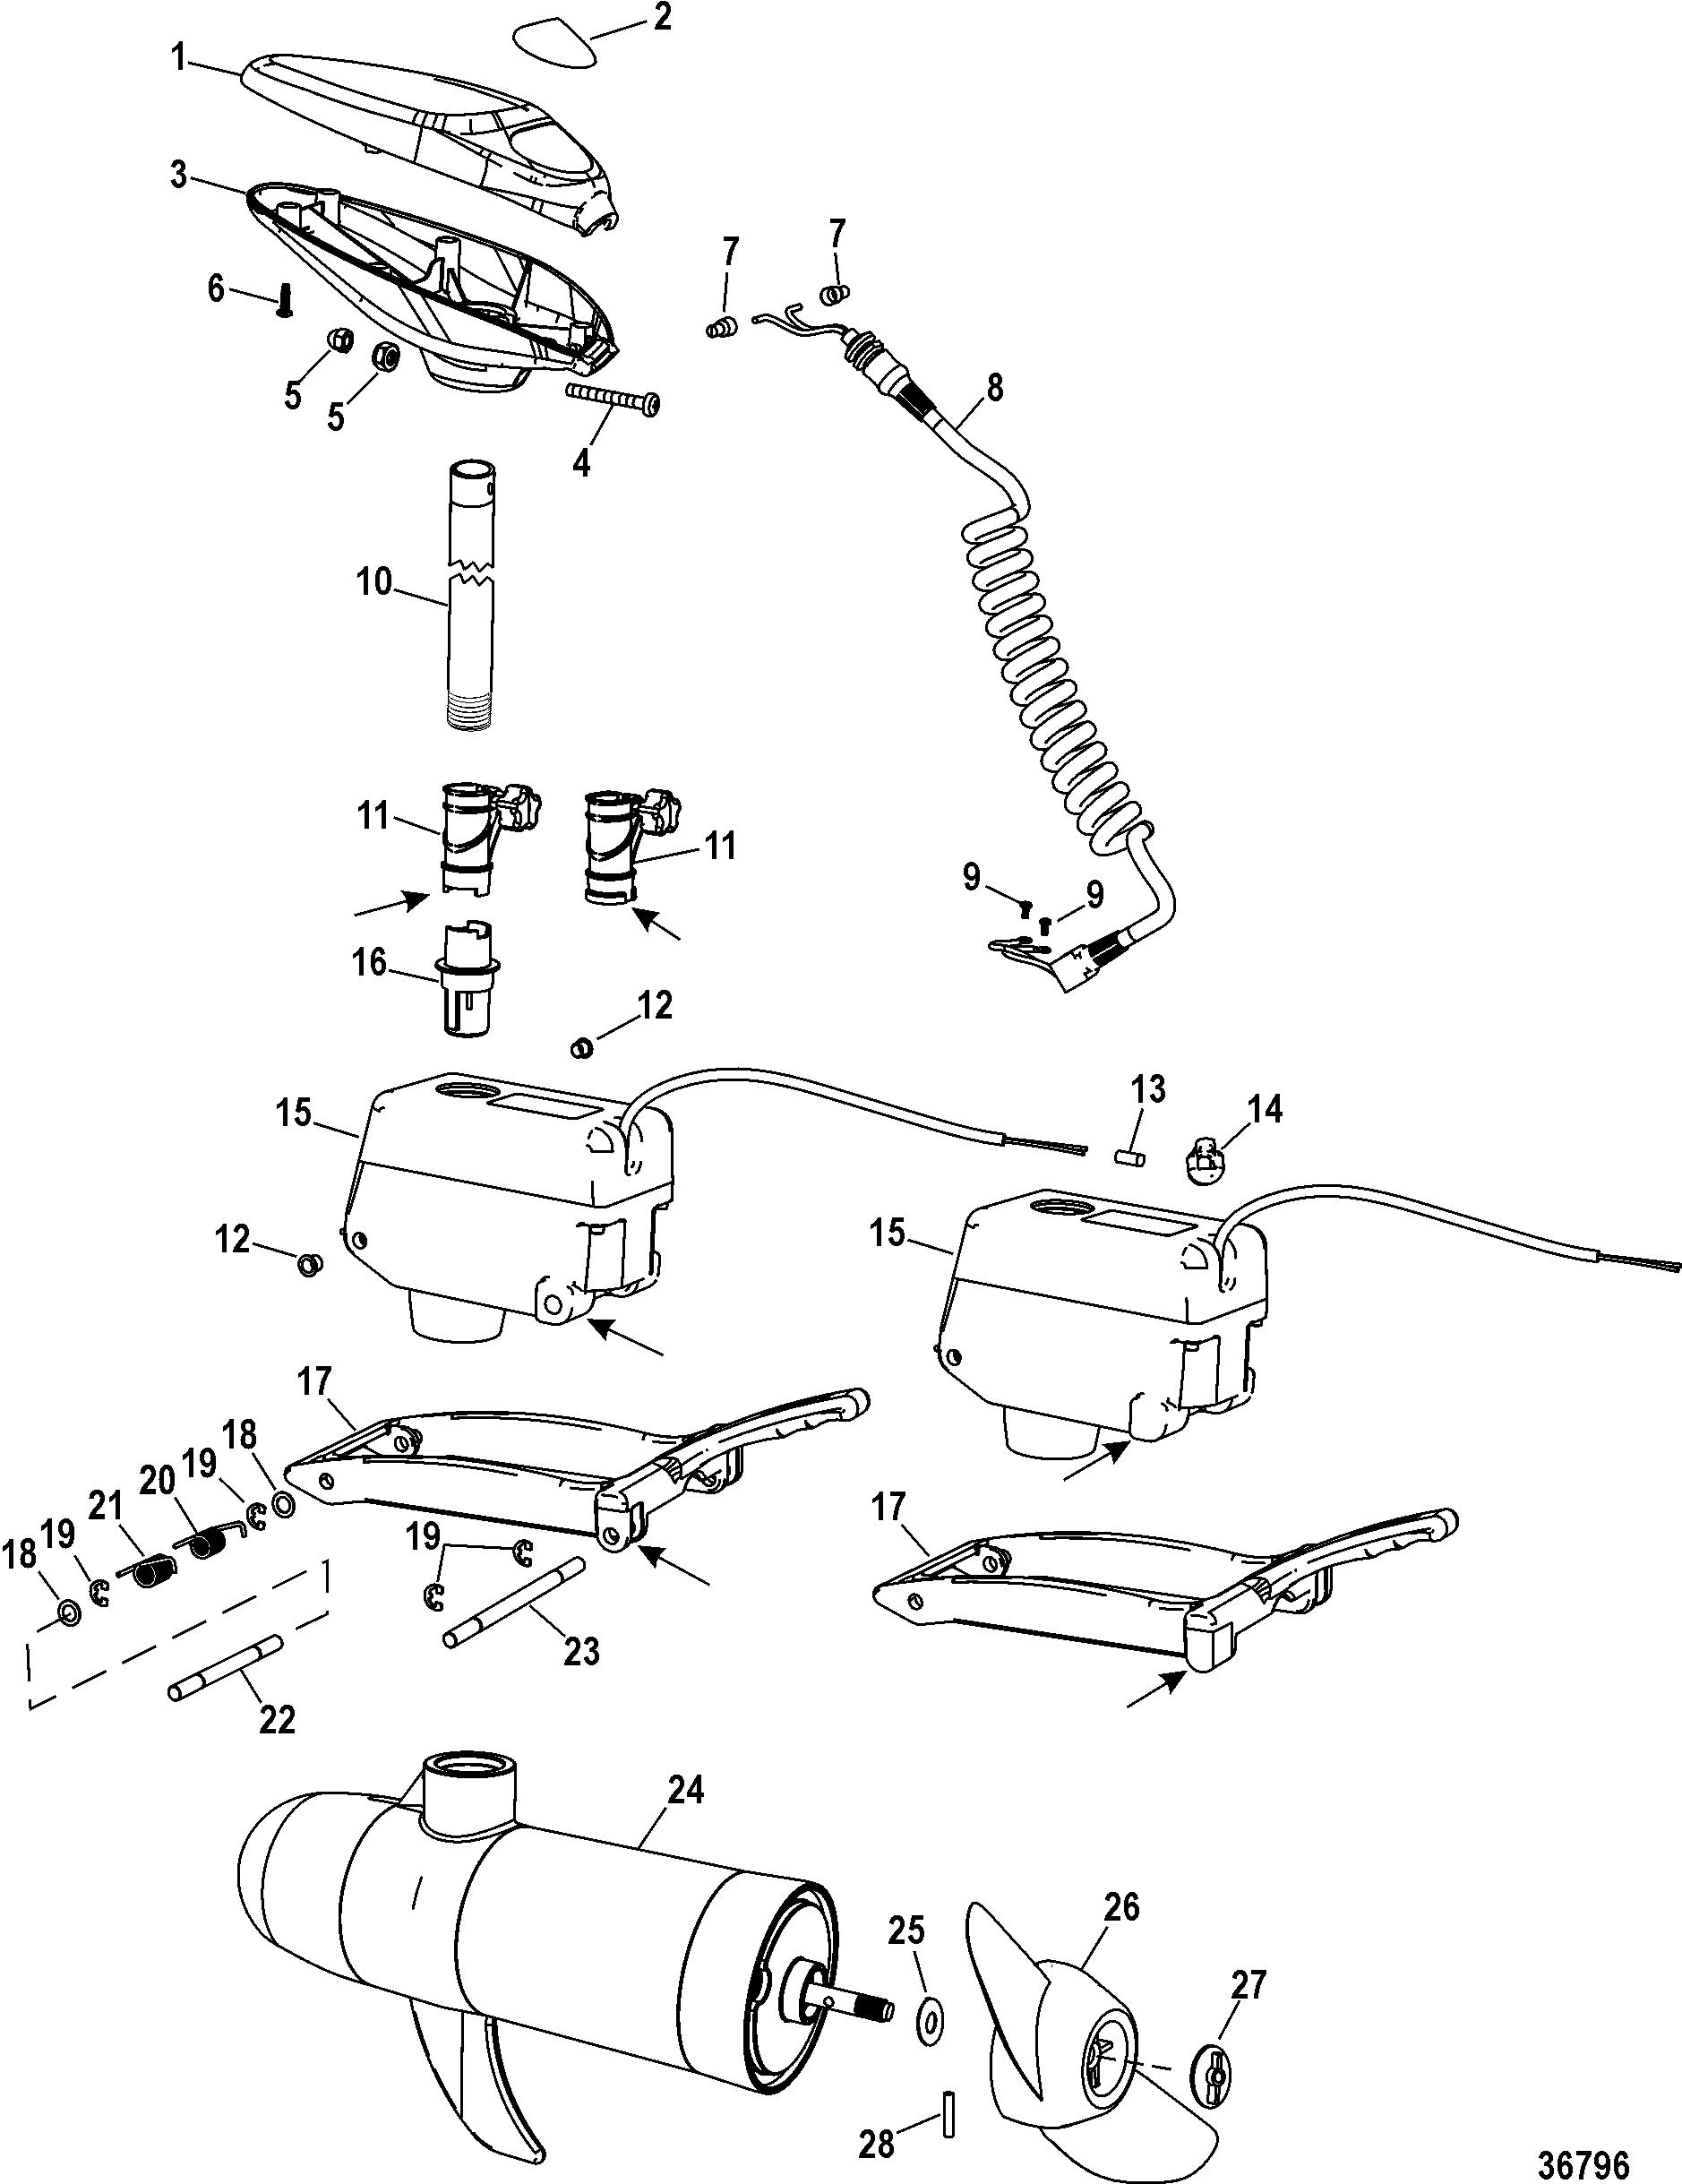 Motorguide T34 Wiring Diagram Trusted Wiring Diagrams Motorola Trolling  Motor Wiring Motorguide Trolling Motor 36v Wiring